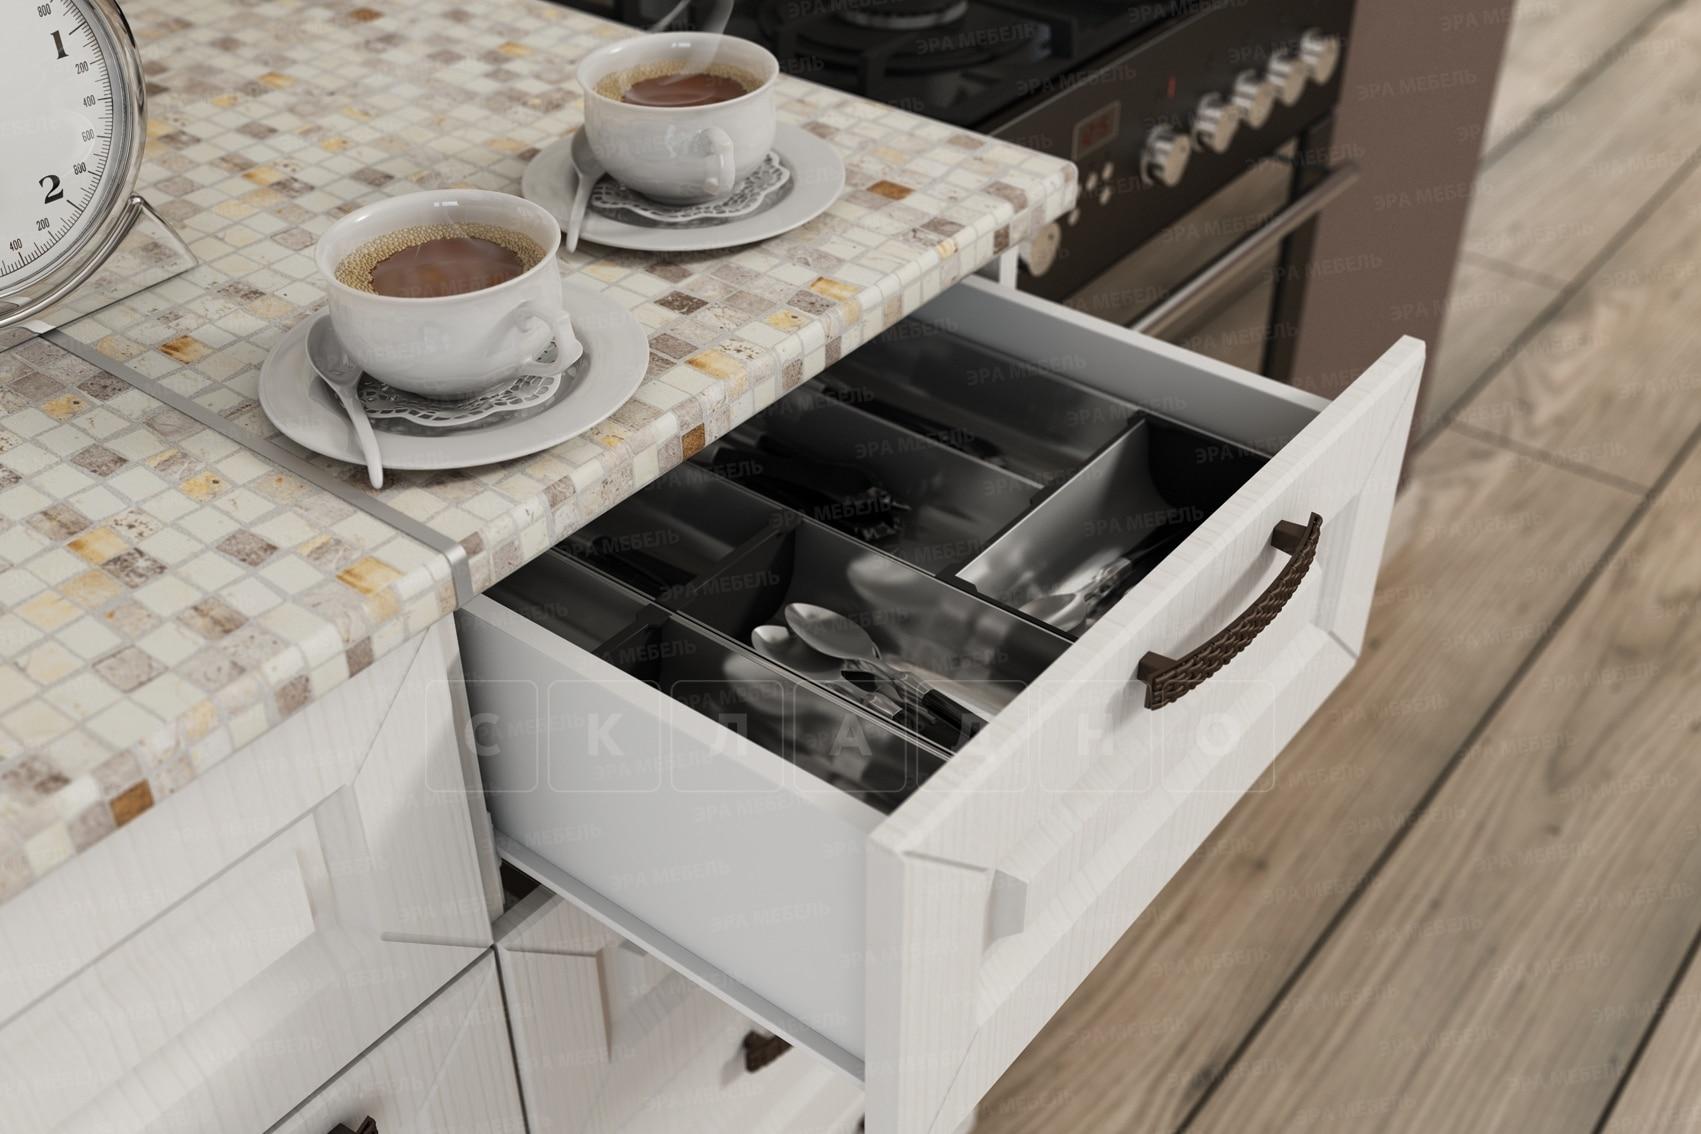 Кухня угловая с пеналом Агава 1,45х2,75м фото 4 | интернет-магазин Складно